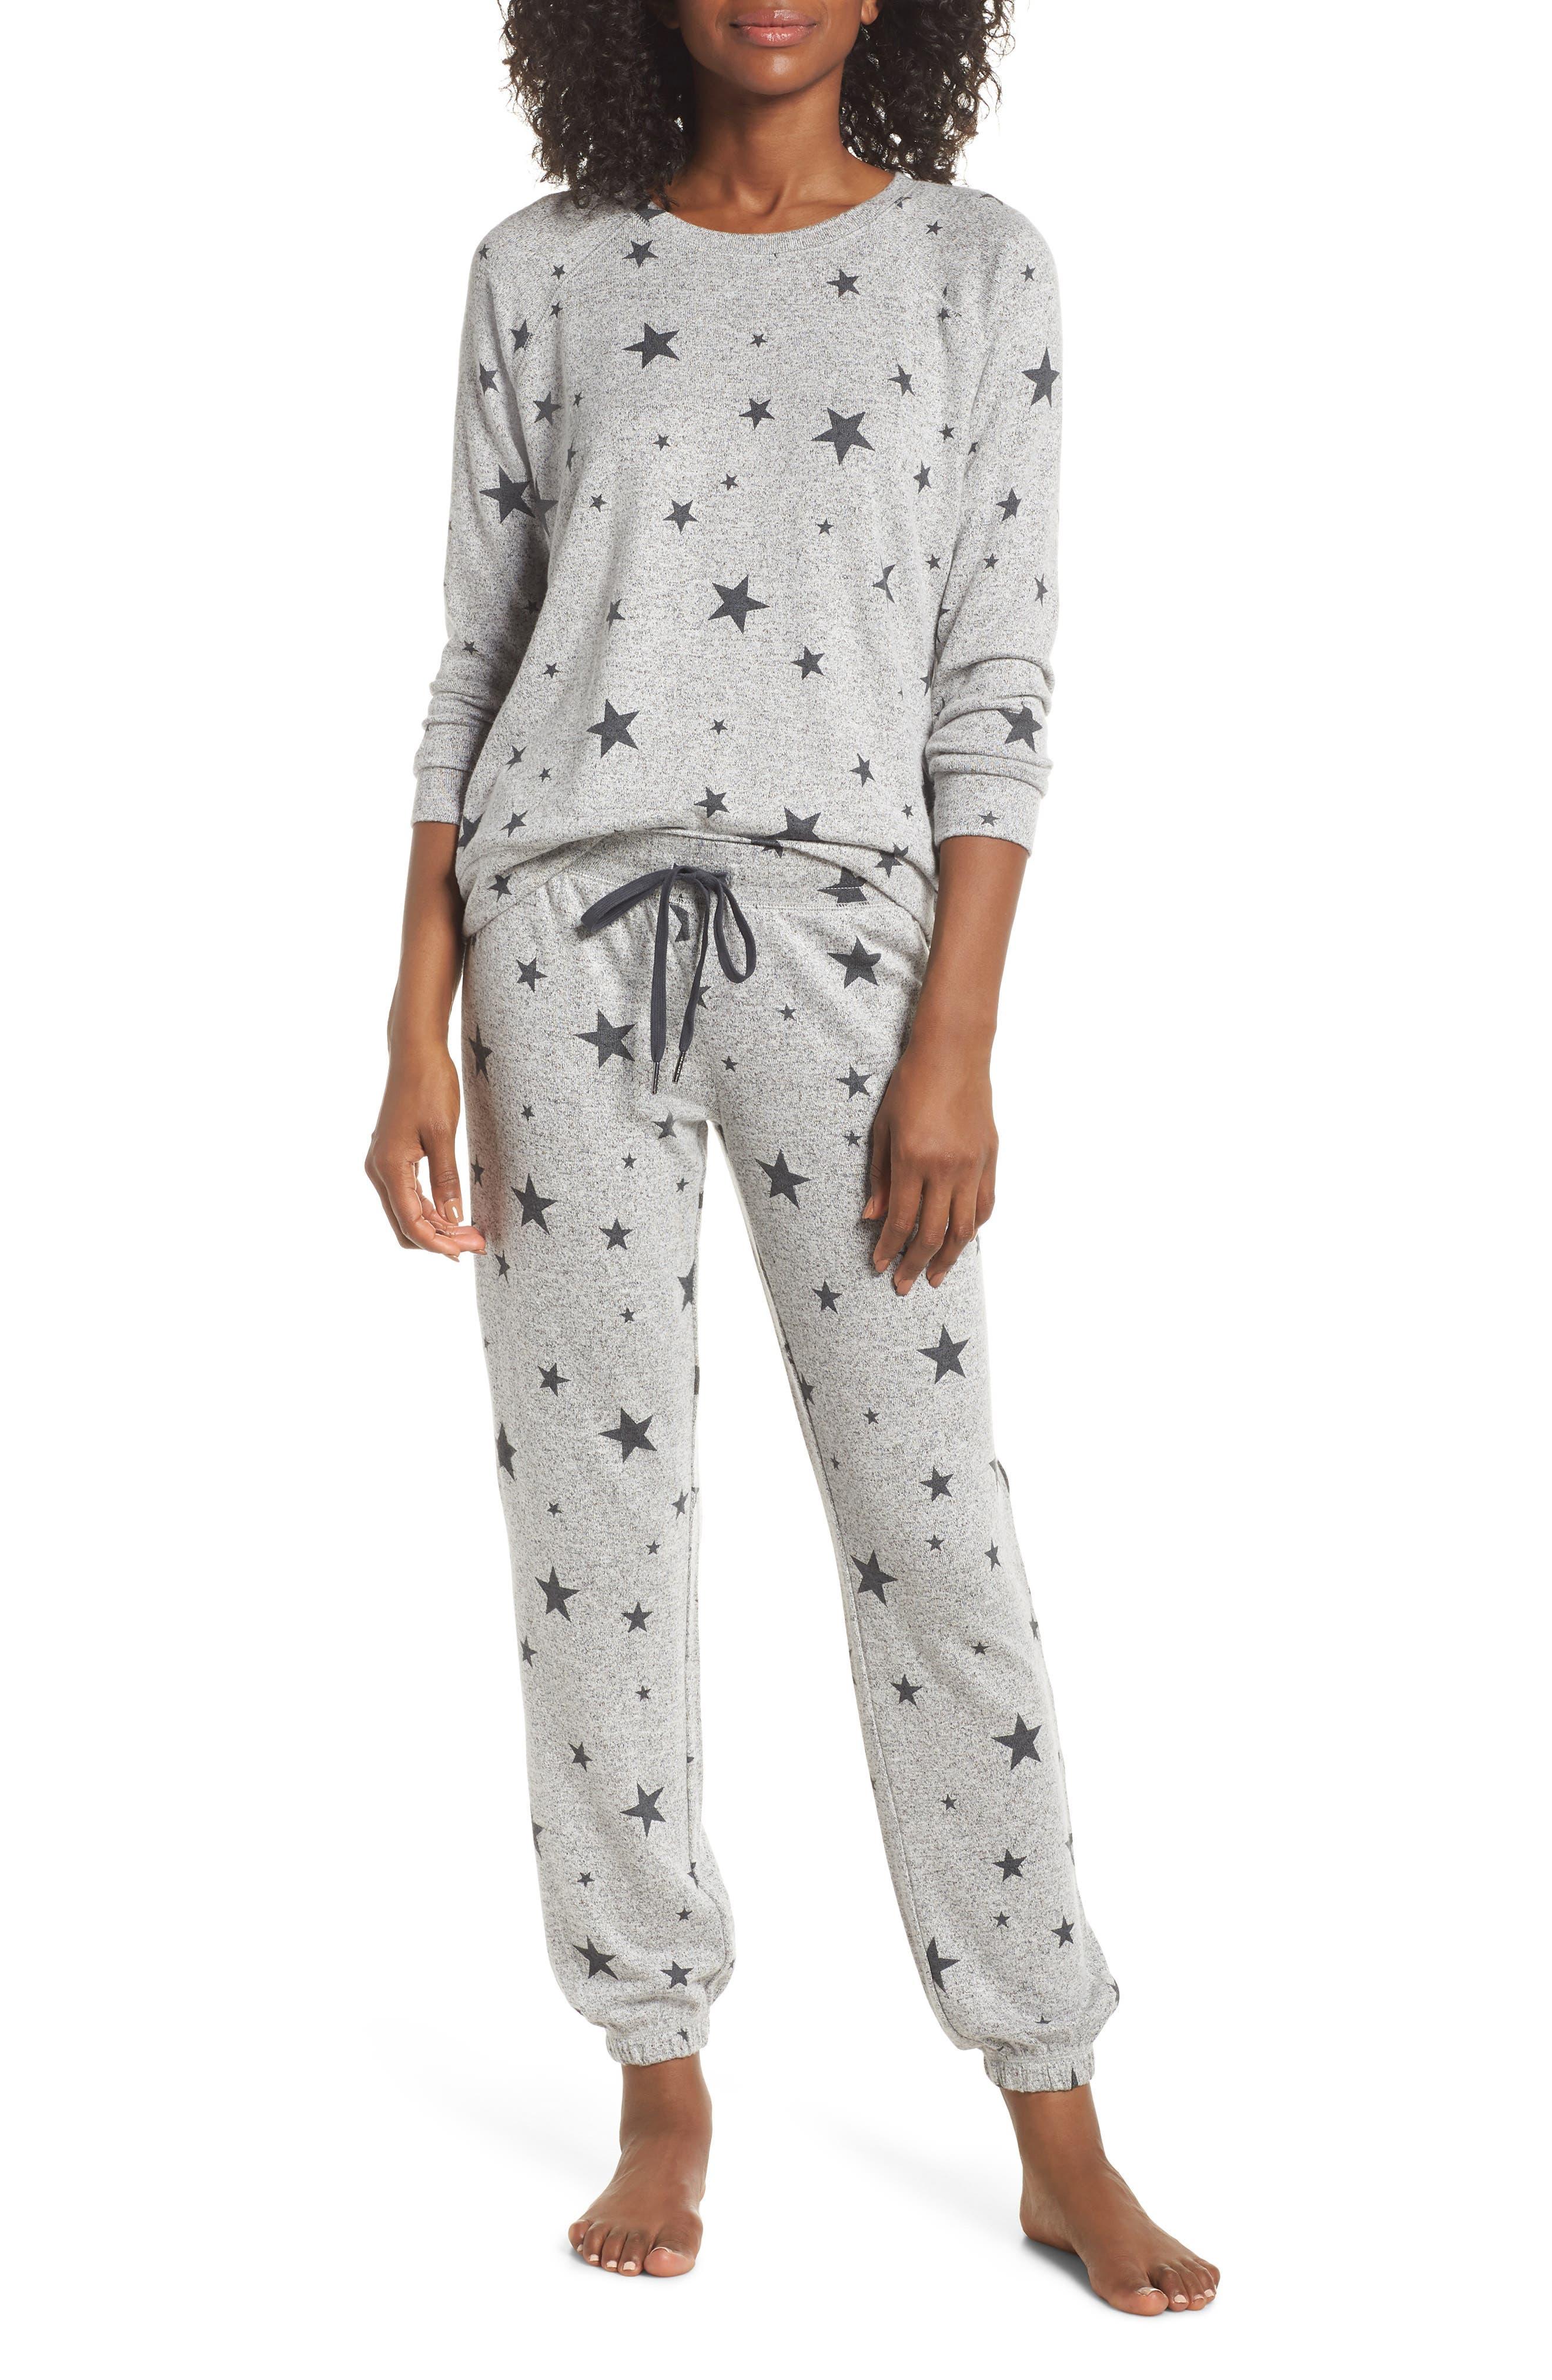 Just Peachy Jogger Pajamas,                         Main,                         color, 007